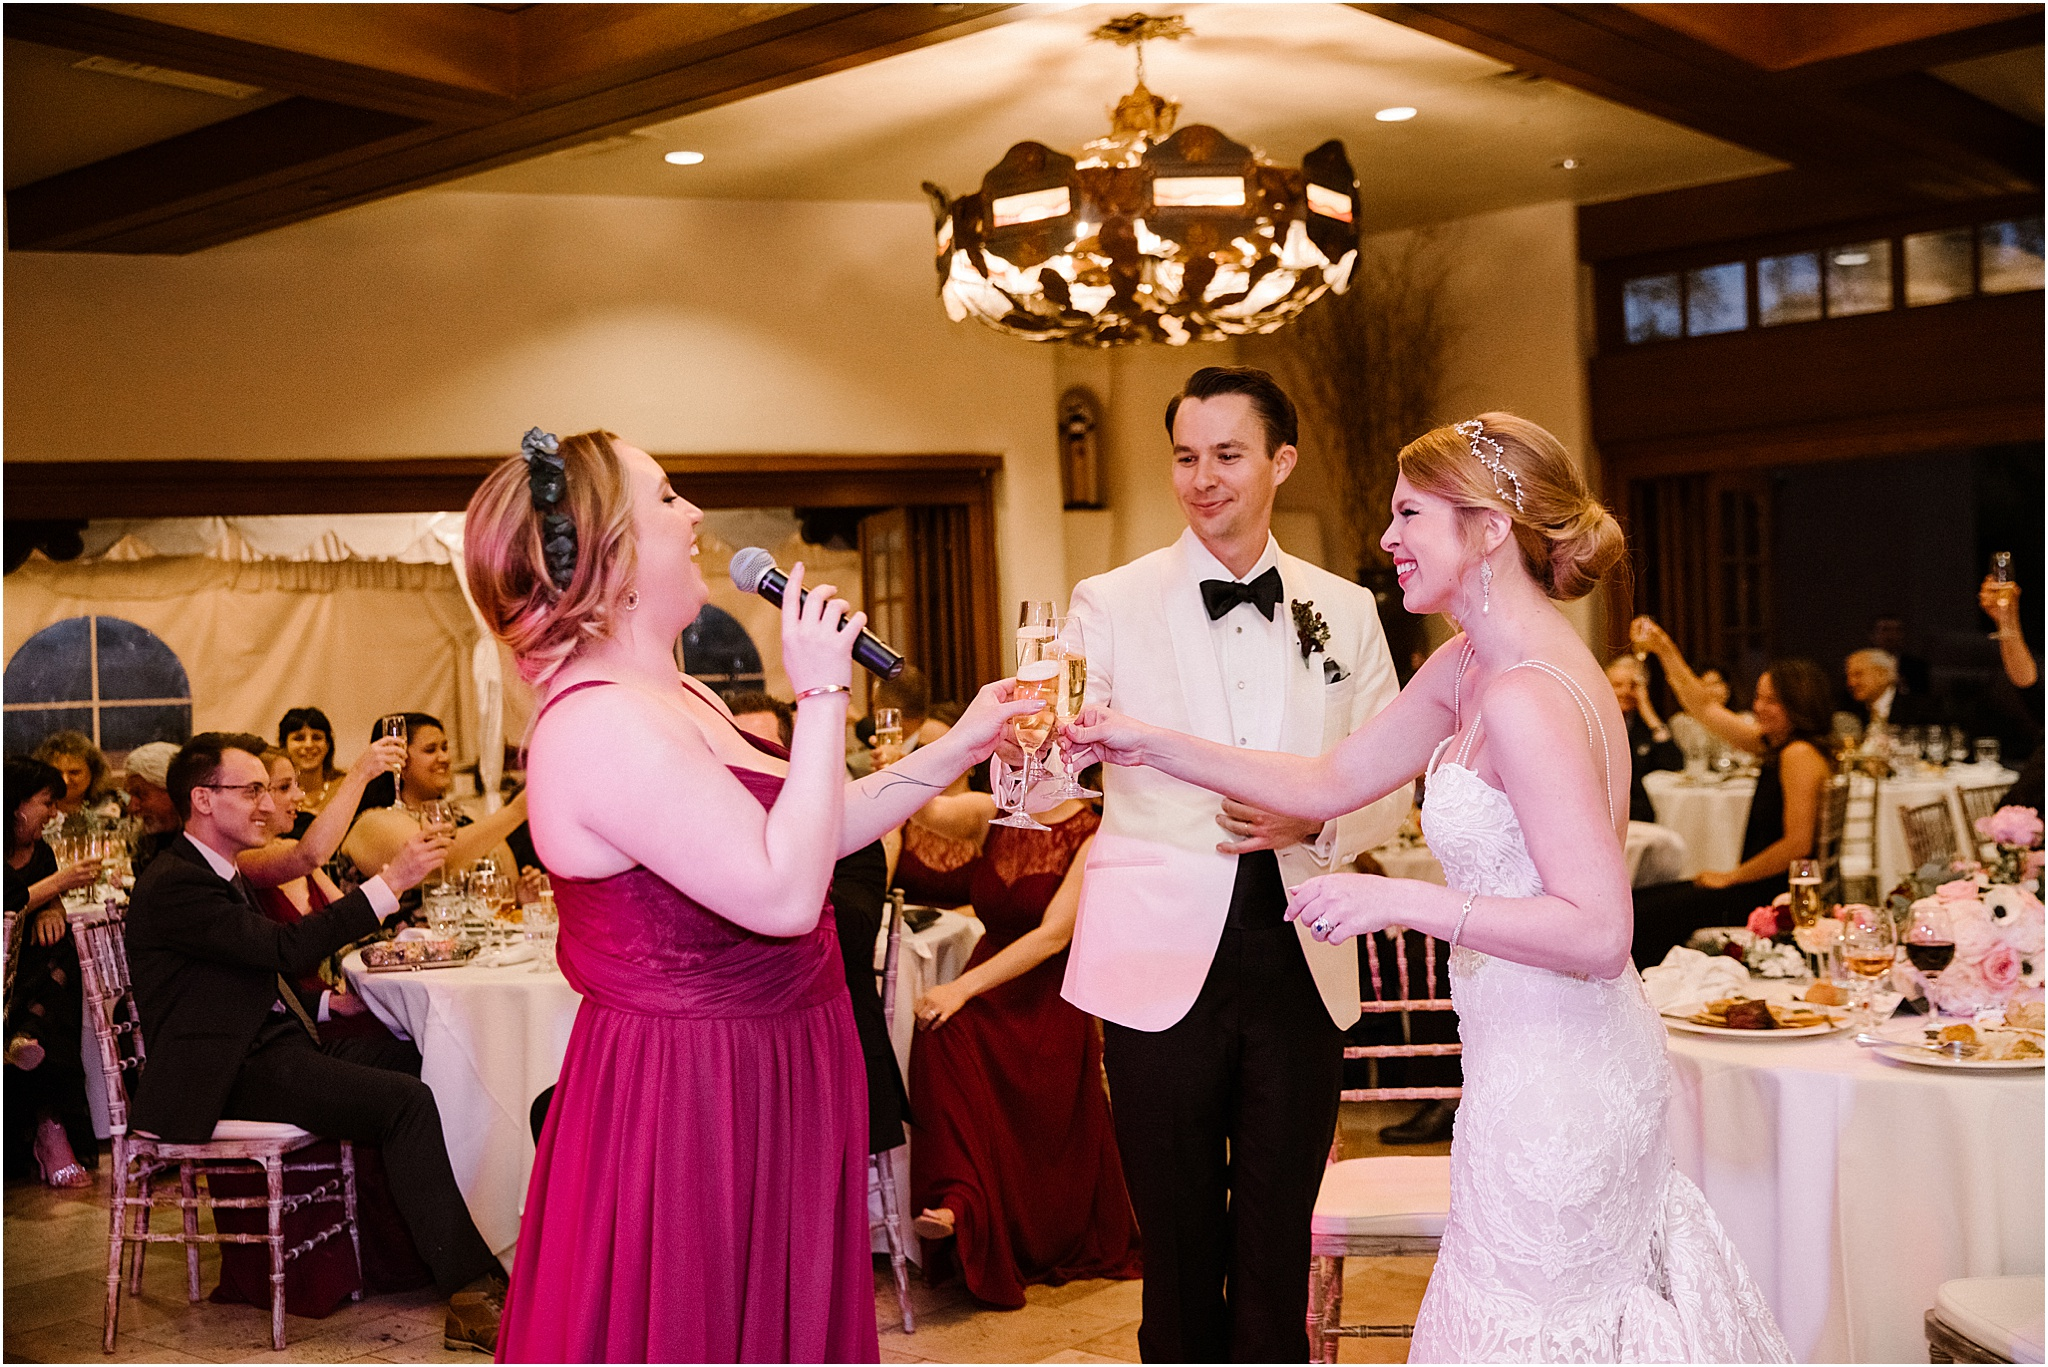 BLUE ROSE PHOTOGRAPHY SANTA FE WEDDING_64